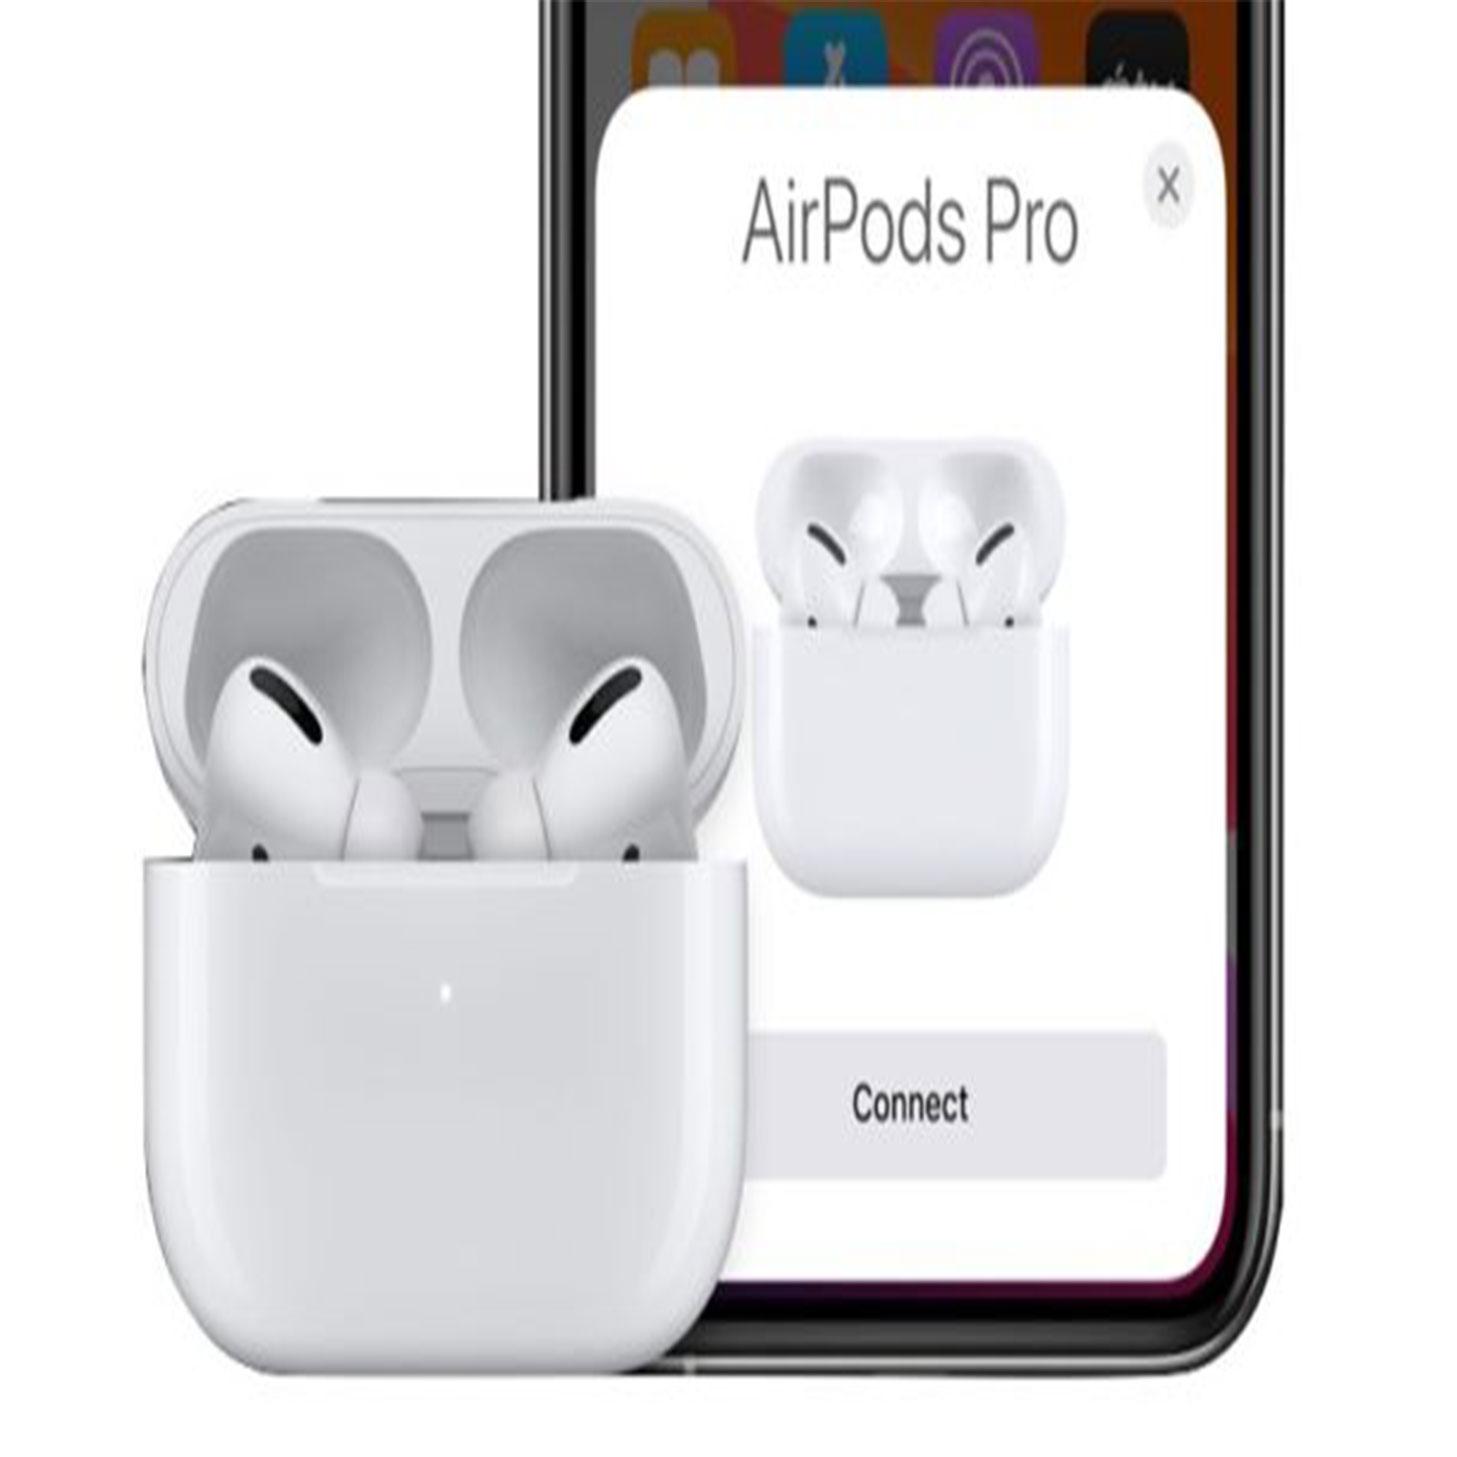 ایرپاد پرو Apple